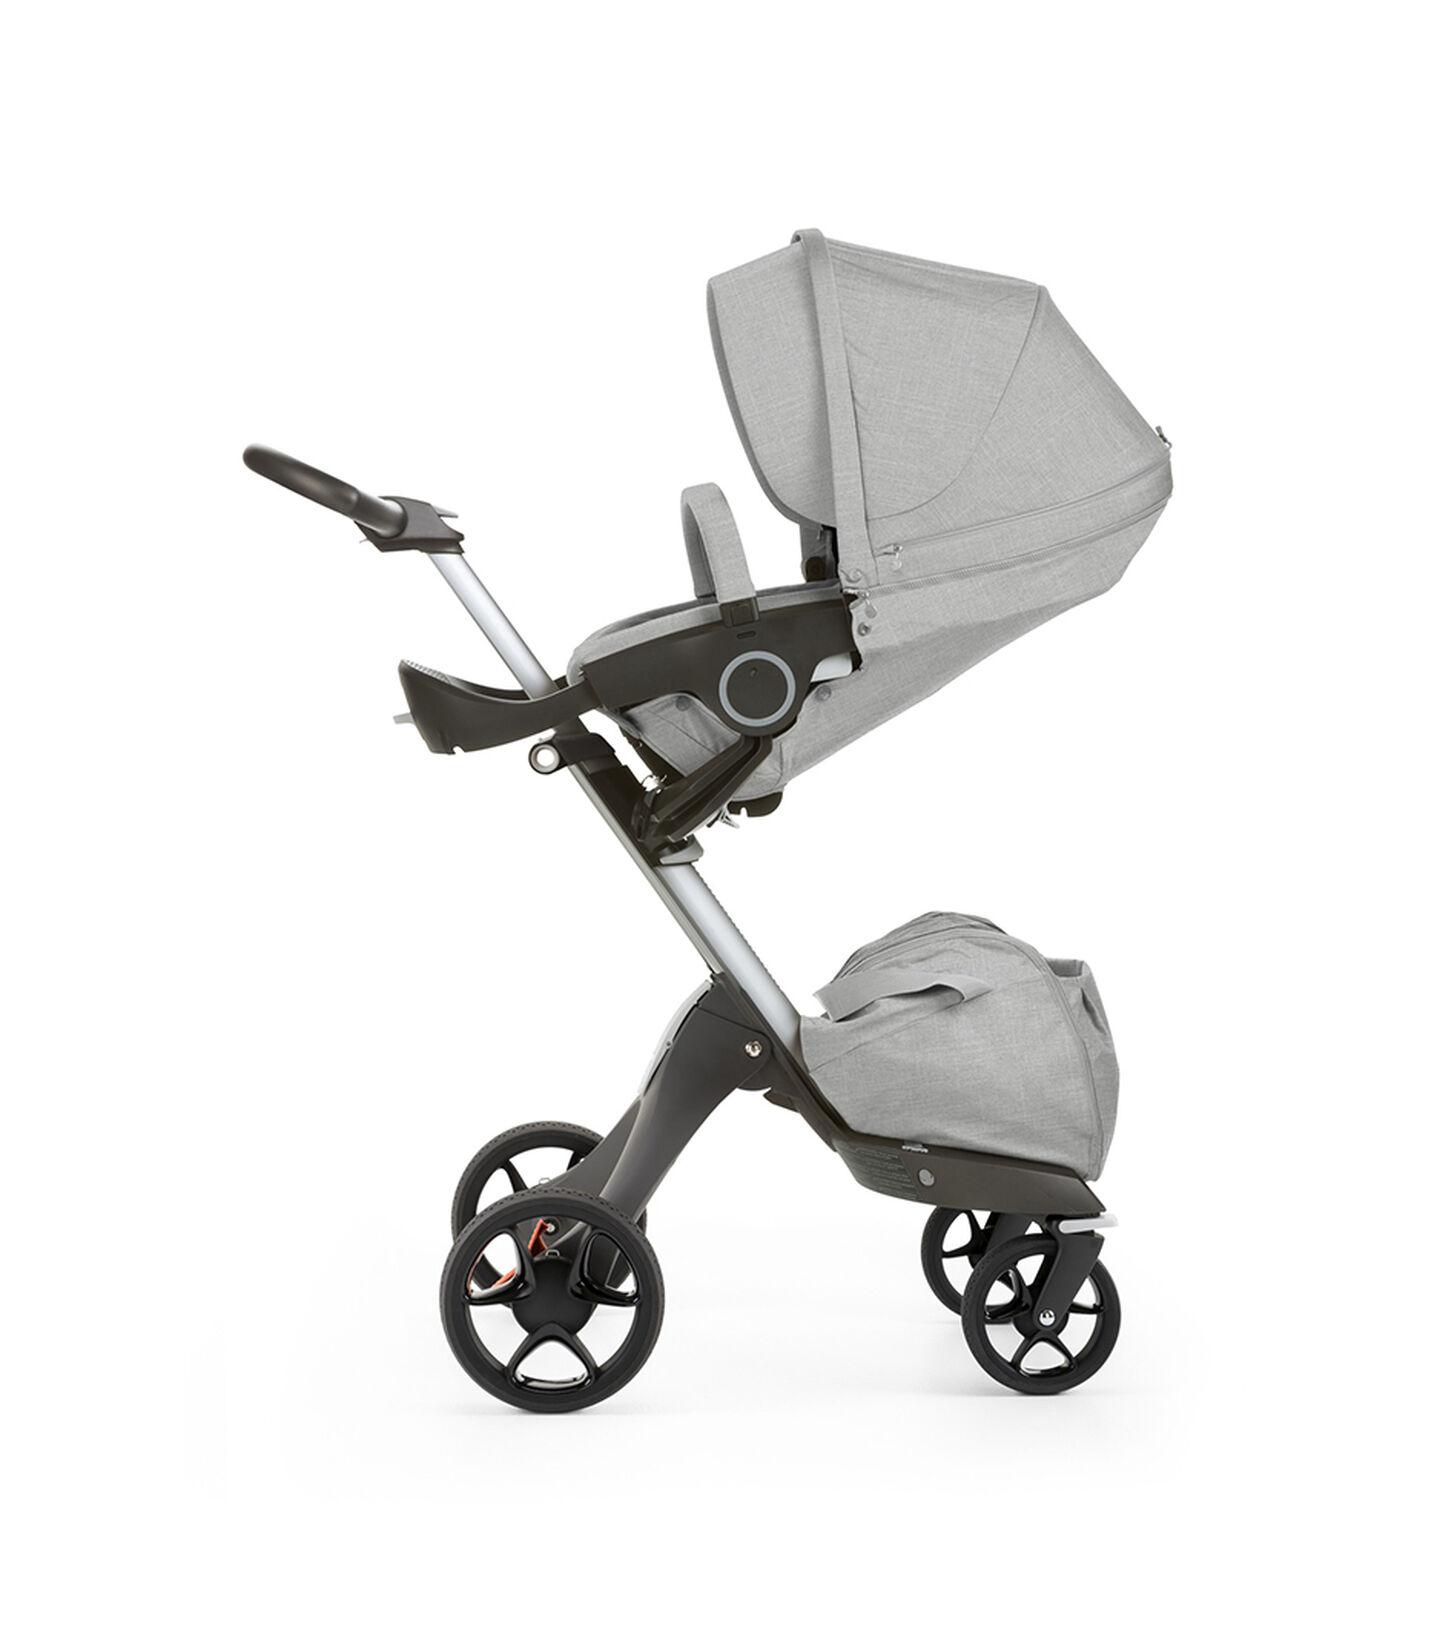 Stokke® Xplory® with Stokke® Stroller Seat, parent facing, sleep position. Grey Melange. New wheels 2016. view 2